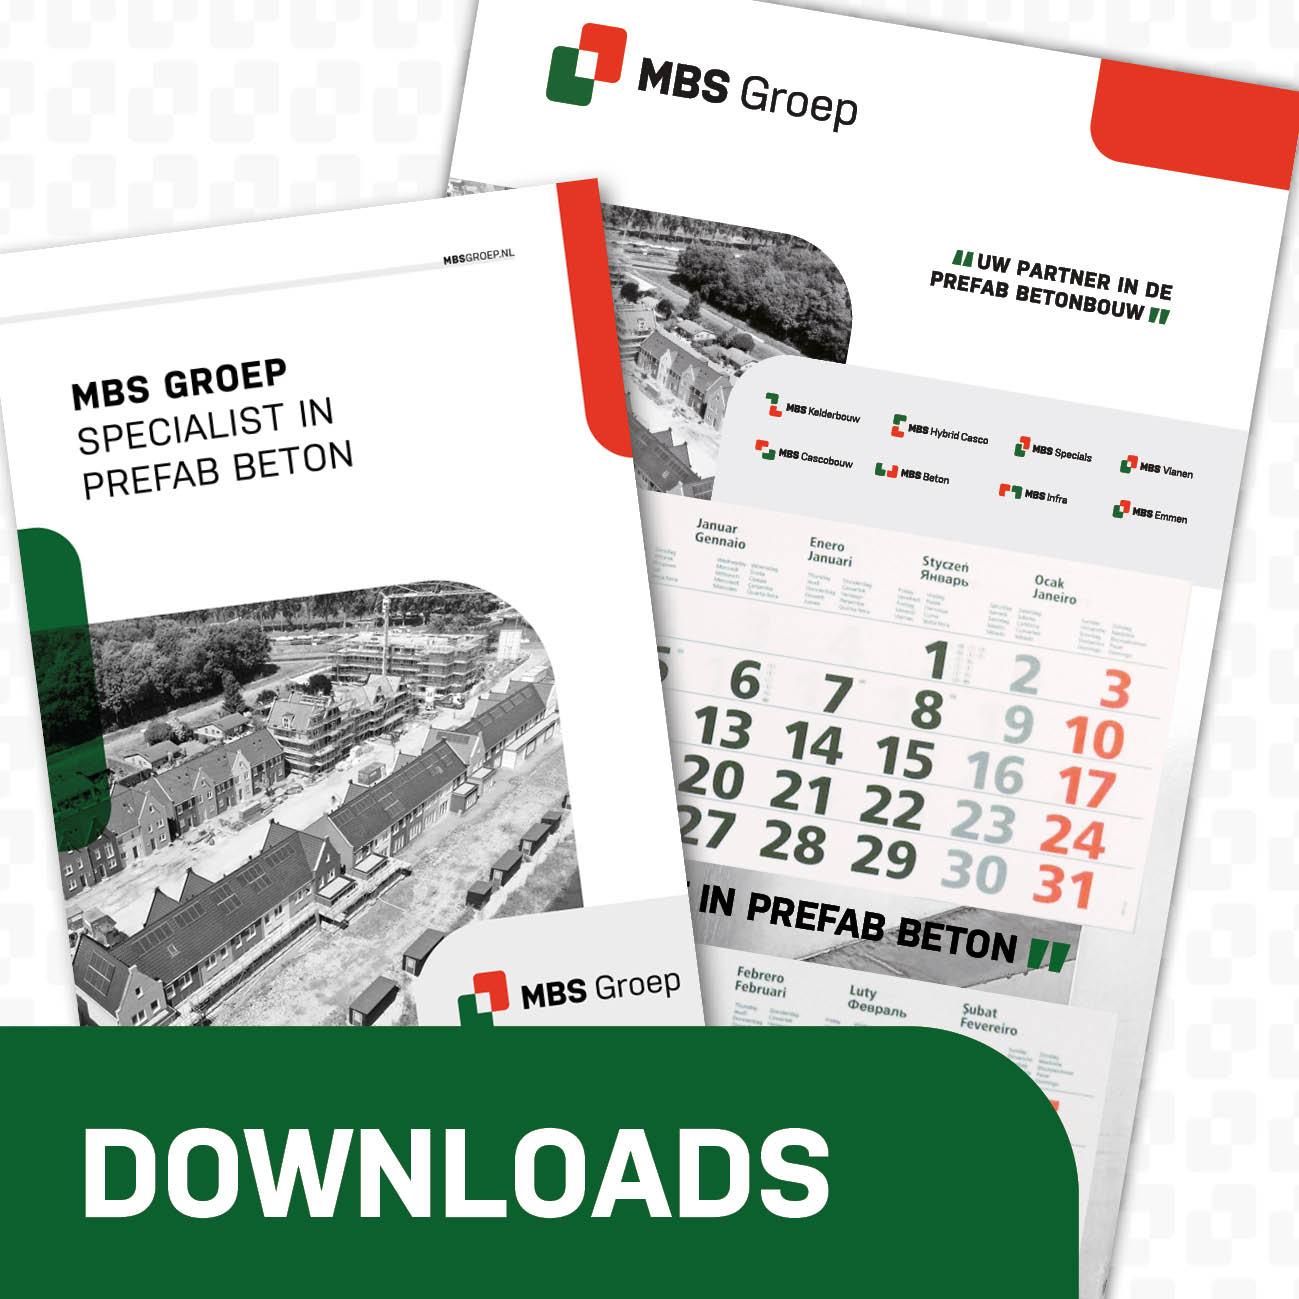 MBS Groep Downloads